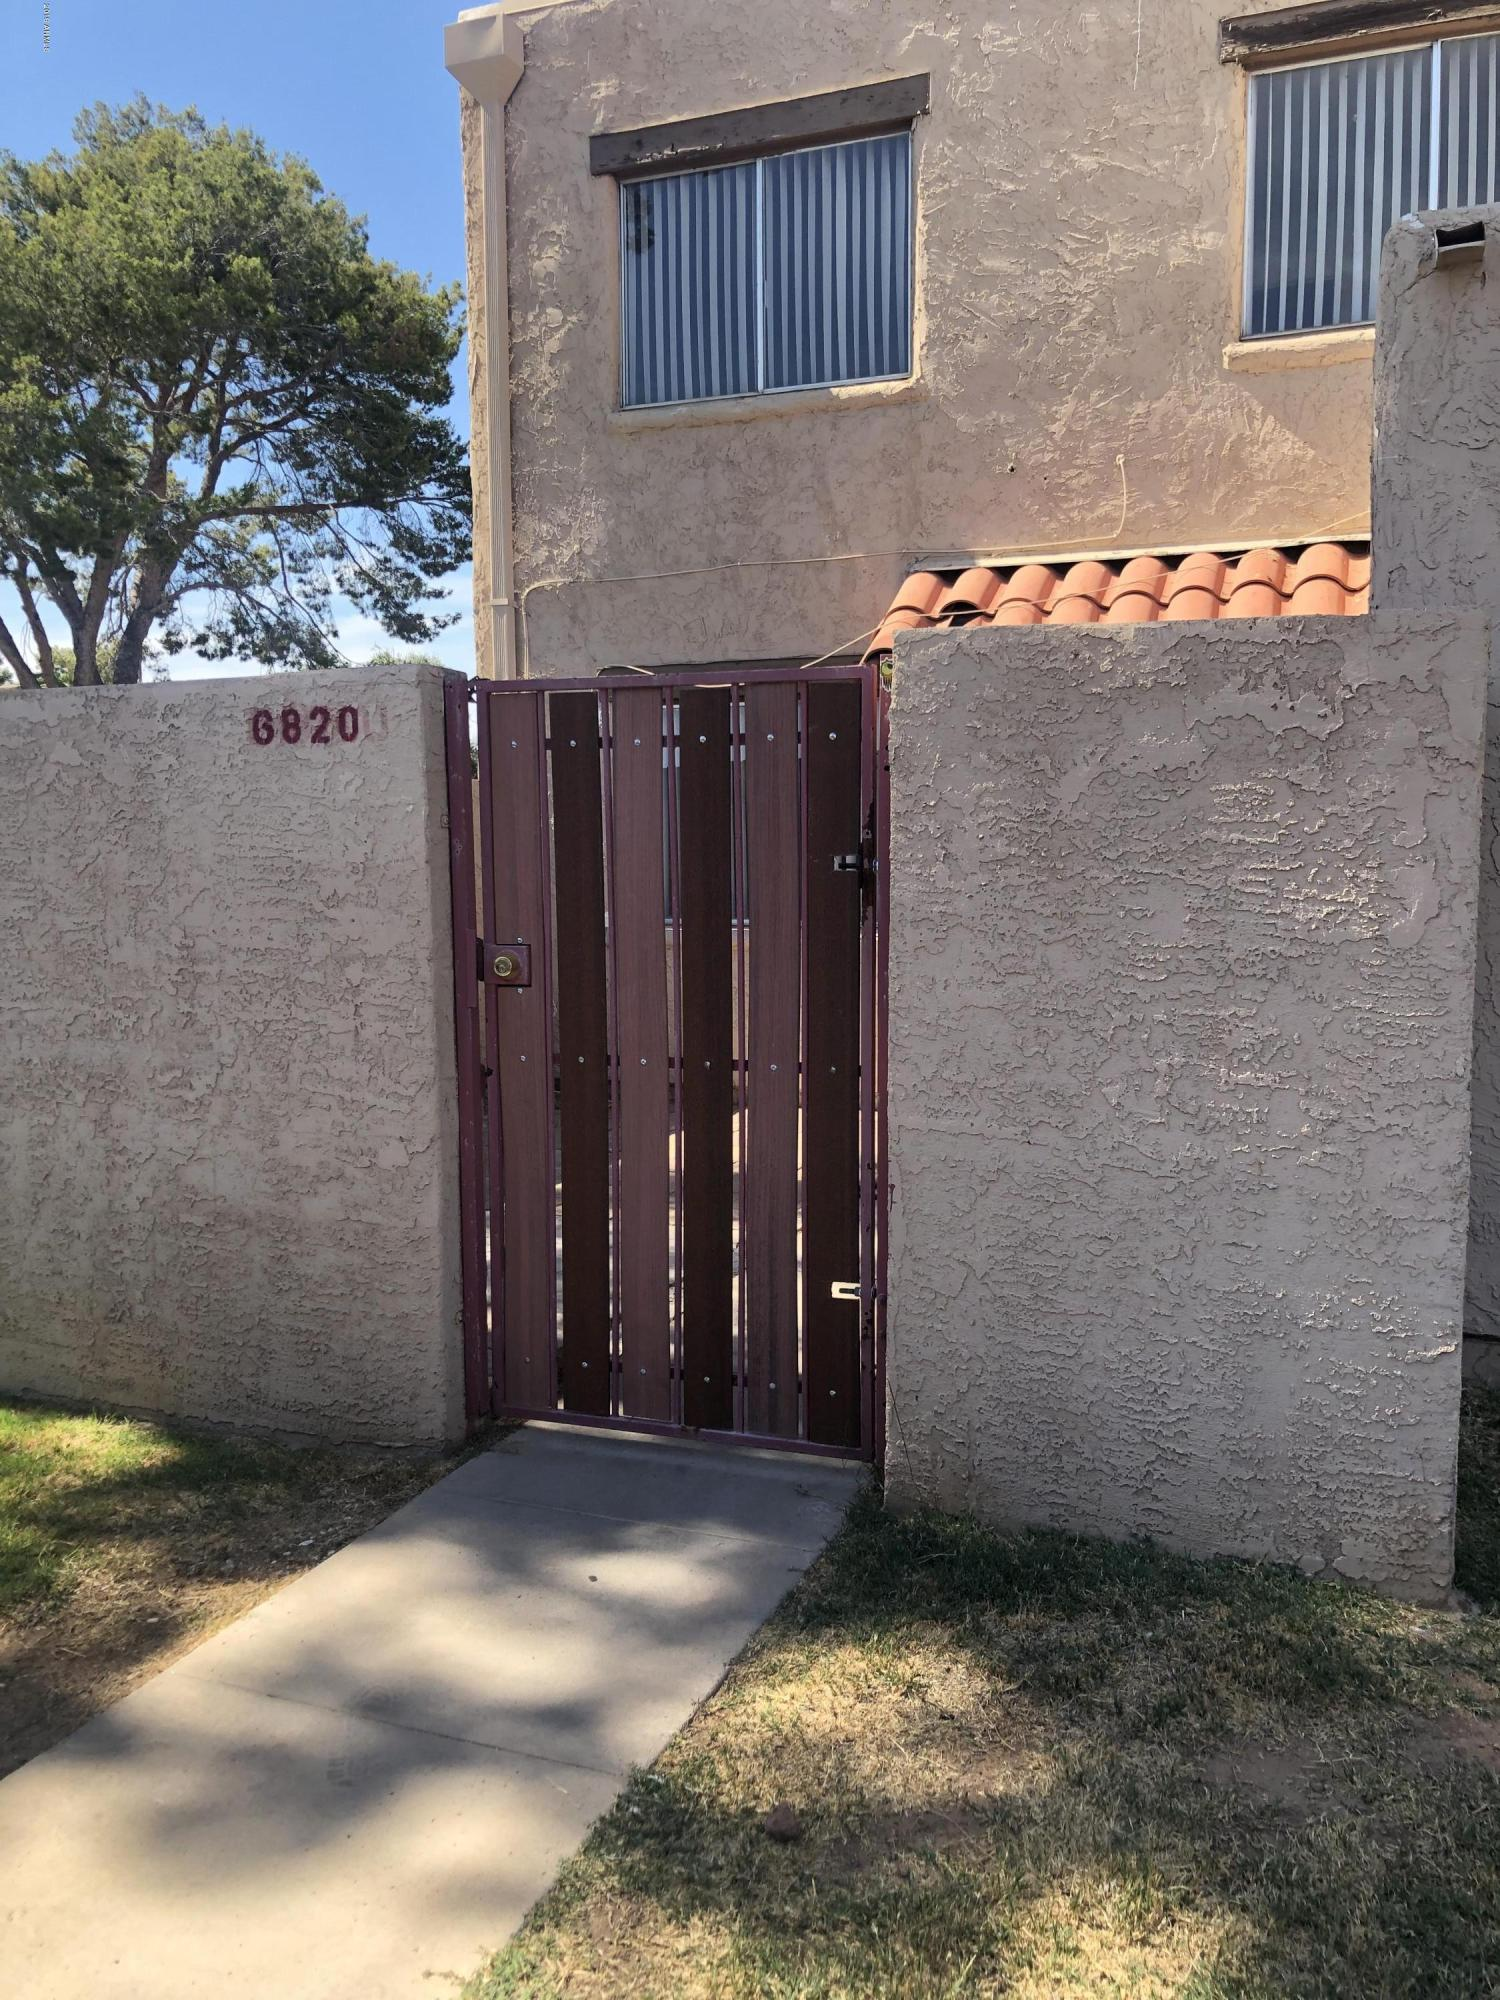 Photo for 6820 W Devonshire Avenue, Phoenix, AZ 85033 (MLS # 5943784)